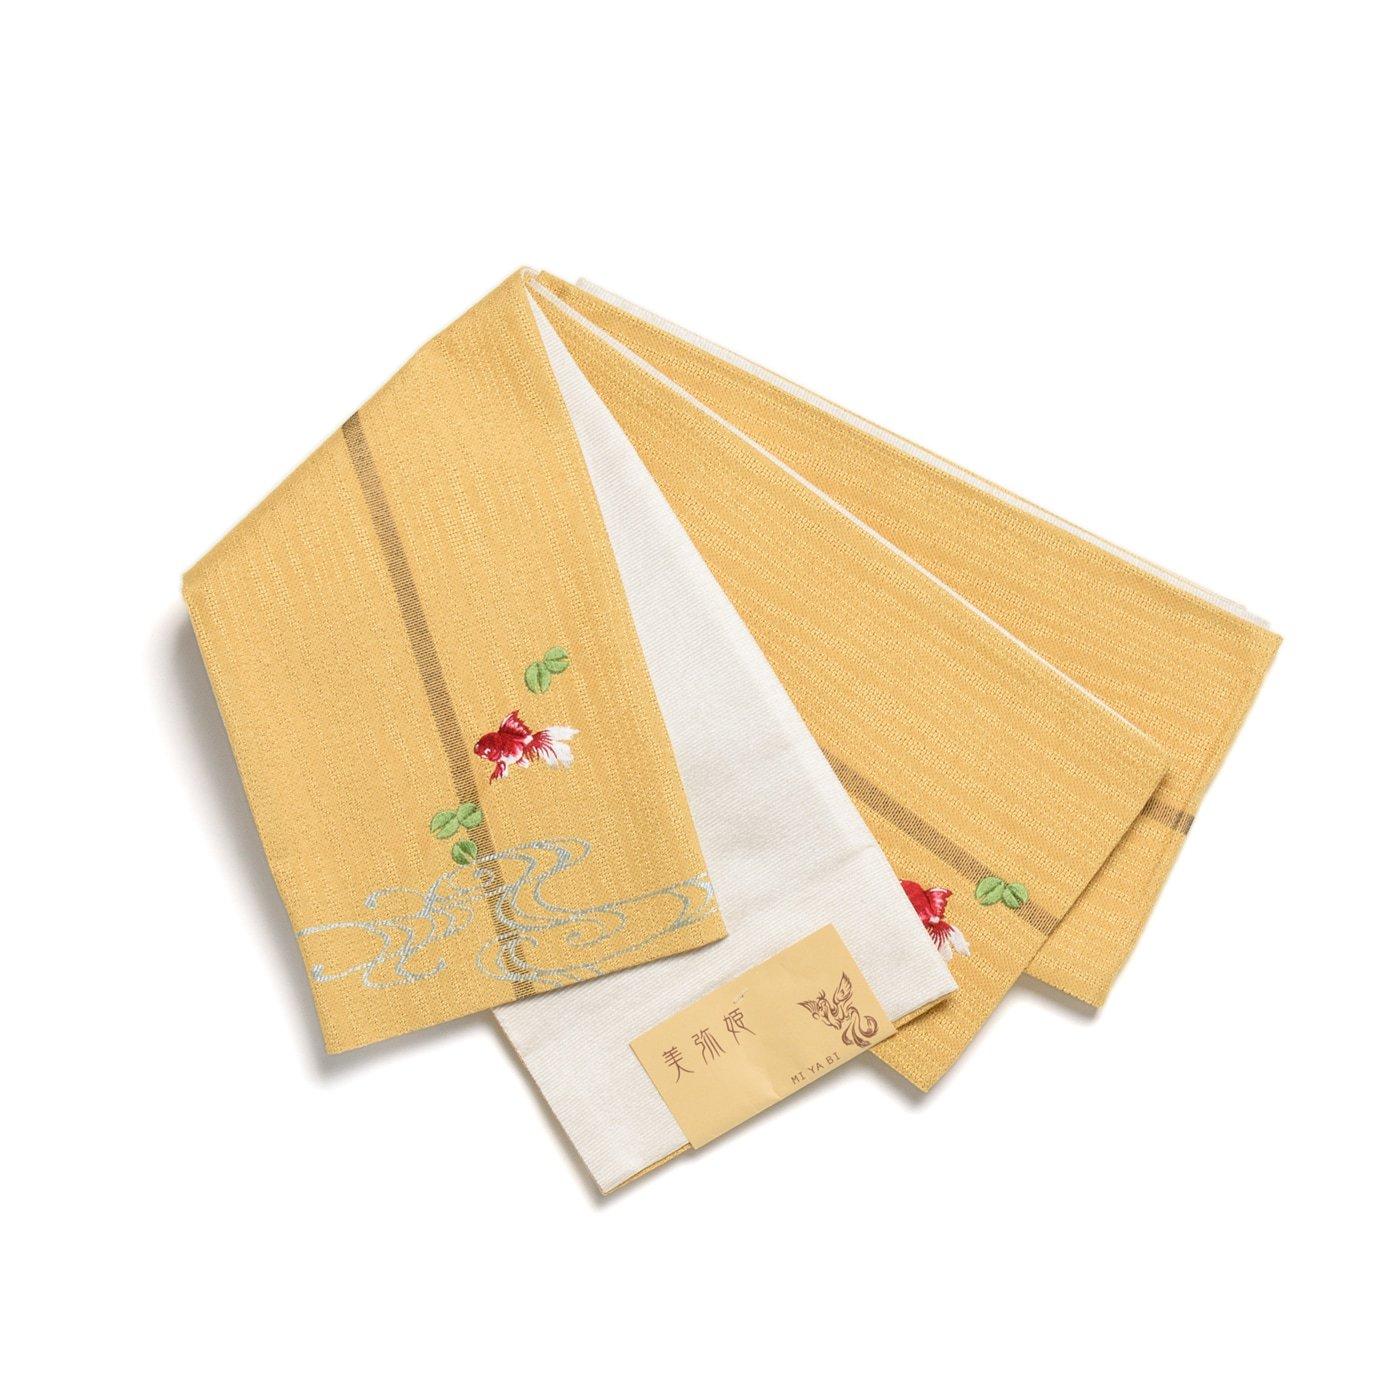 「半幅帯 黄色地×金魚」の商品画像